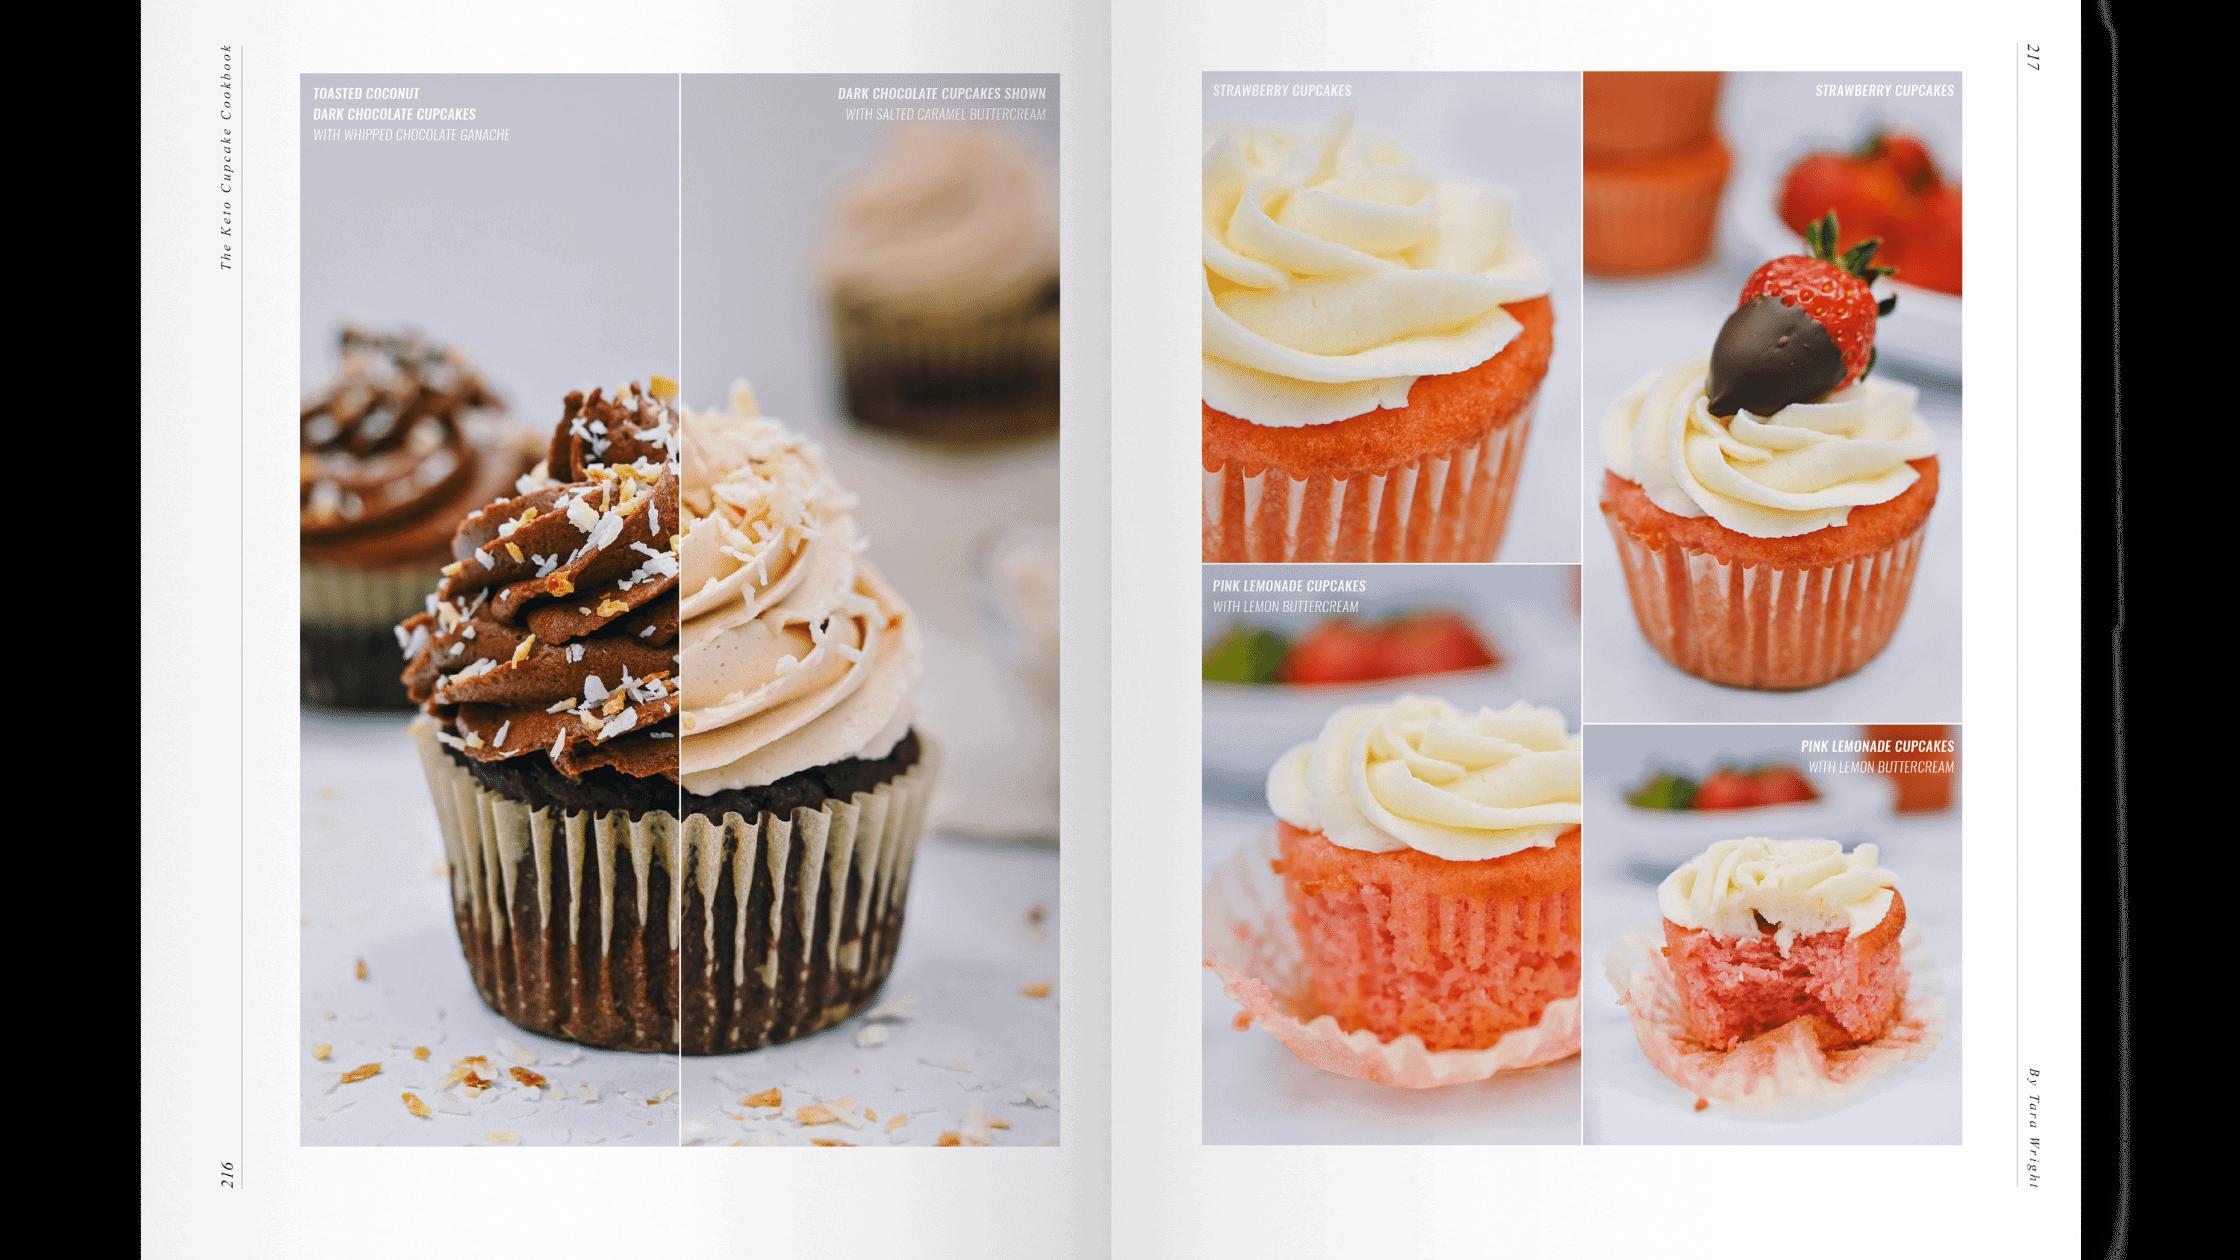 keto cupcake cookbook with chocolate cupcakes